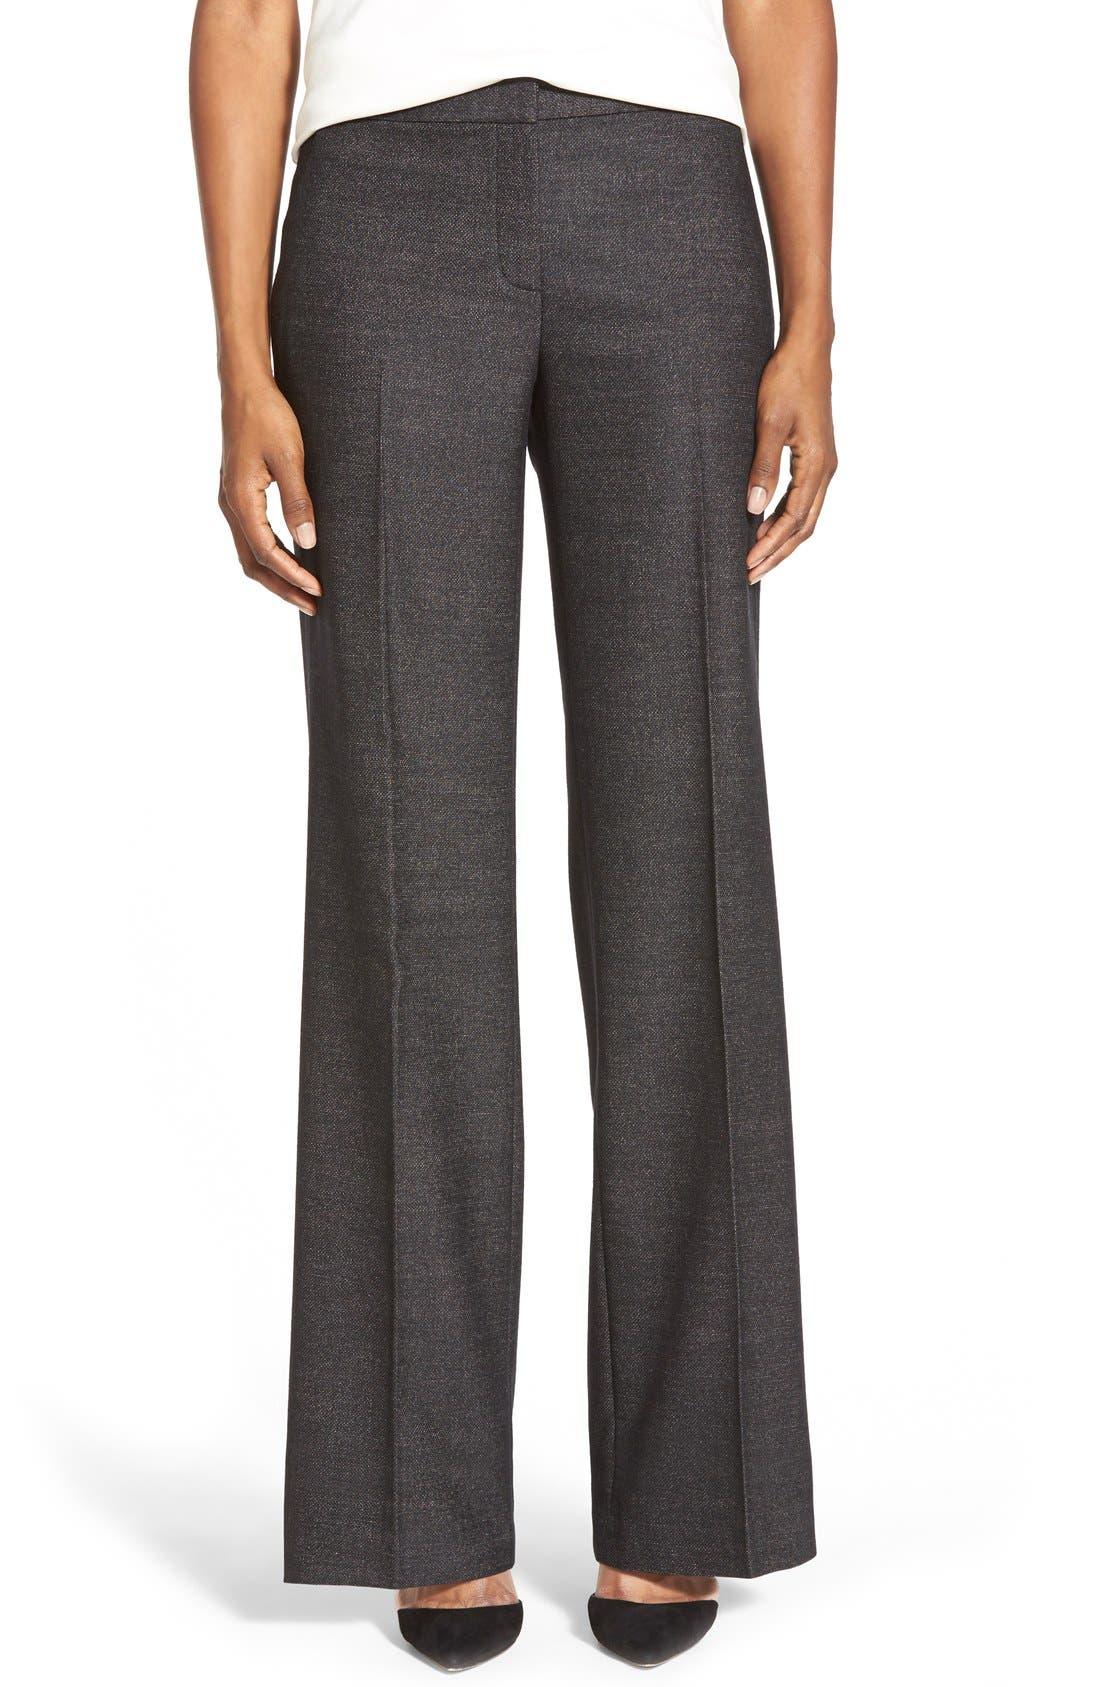 Alternate Image 1 Selected - Classiques Entier® 'Verona' Suiting Trousers (Regular & Petite)